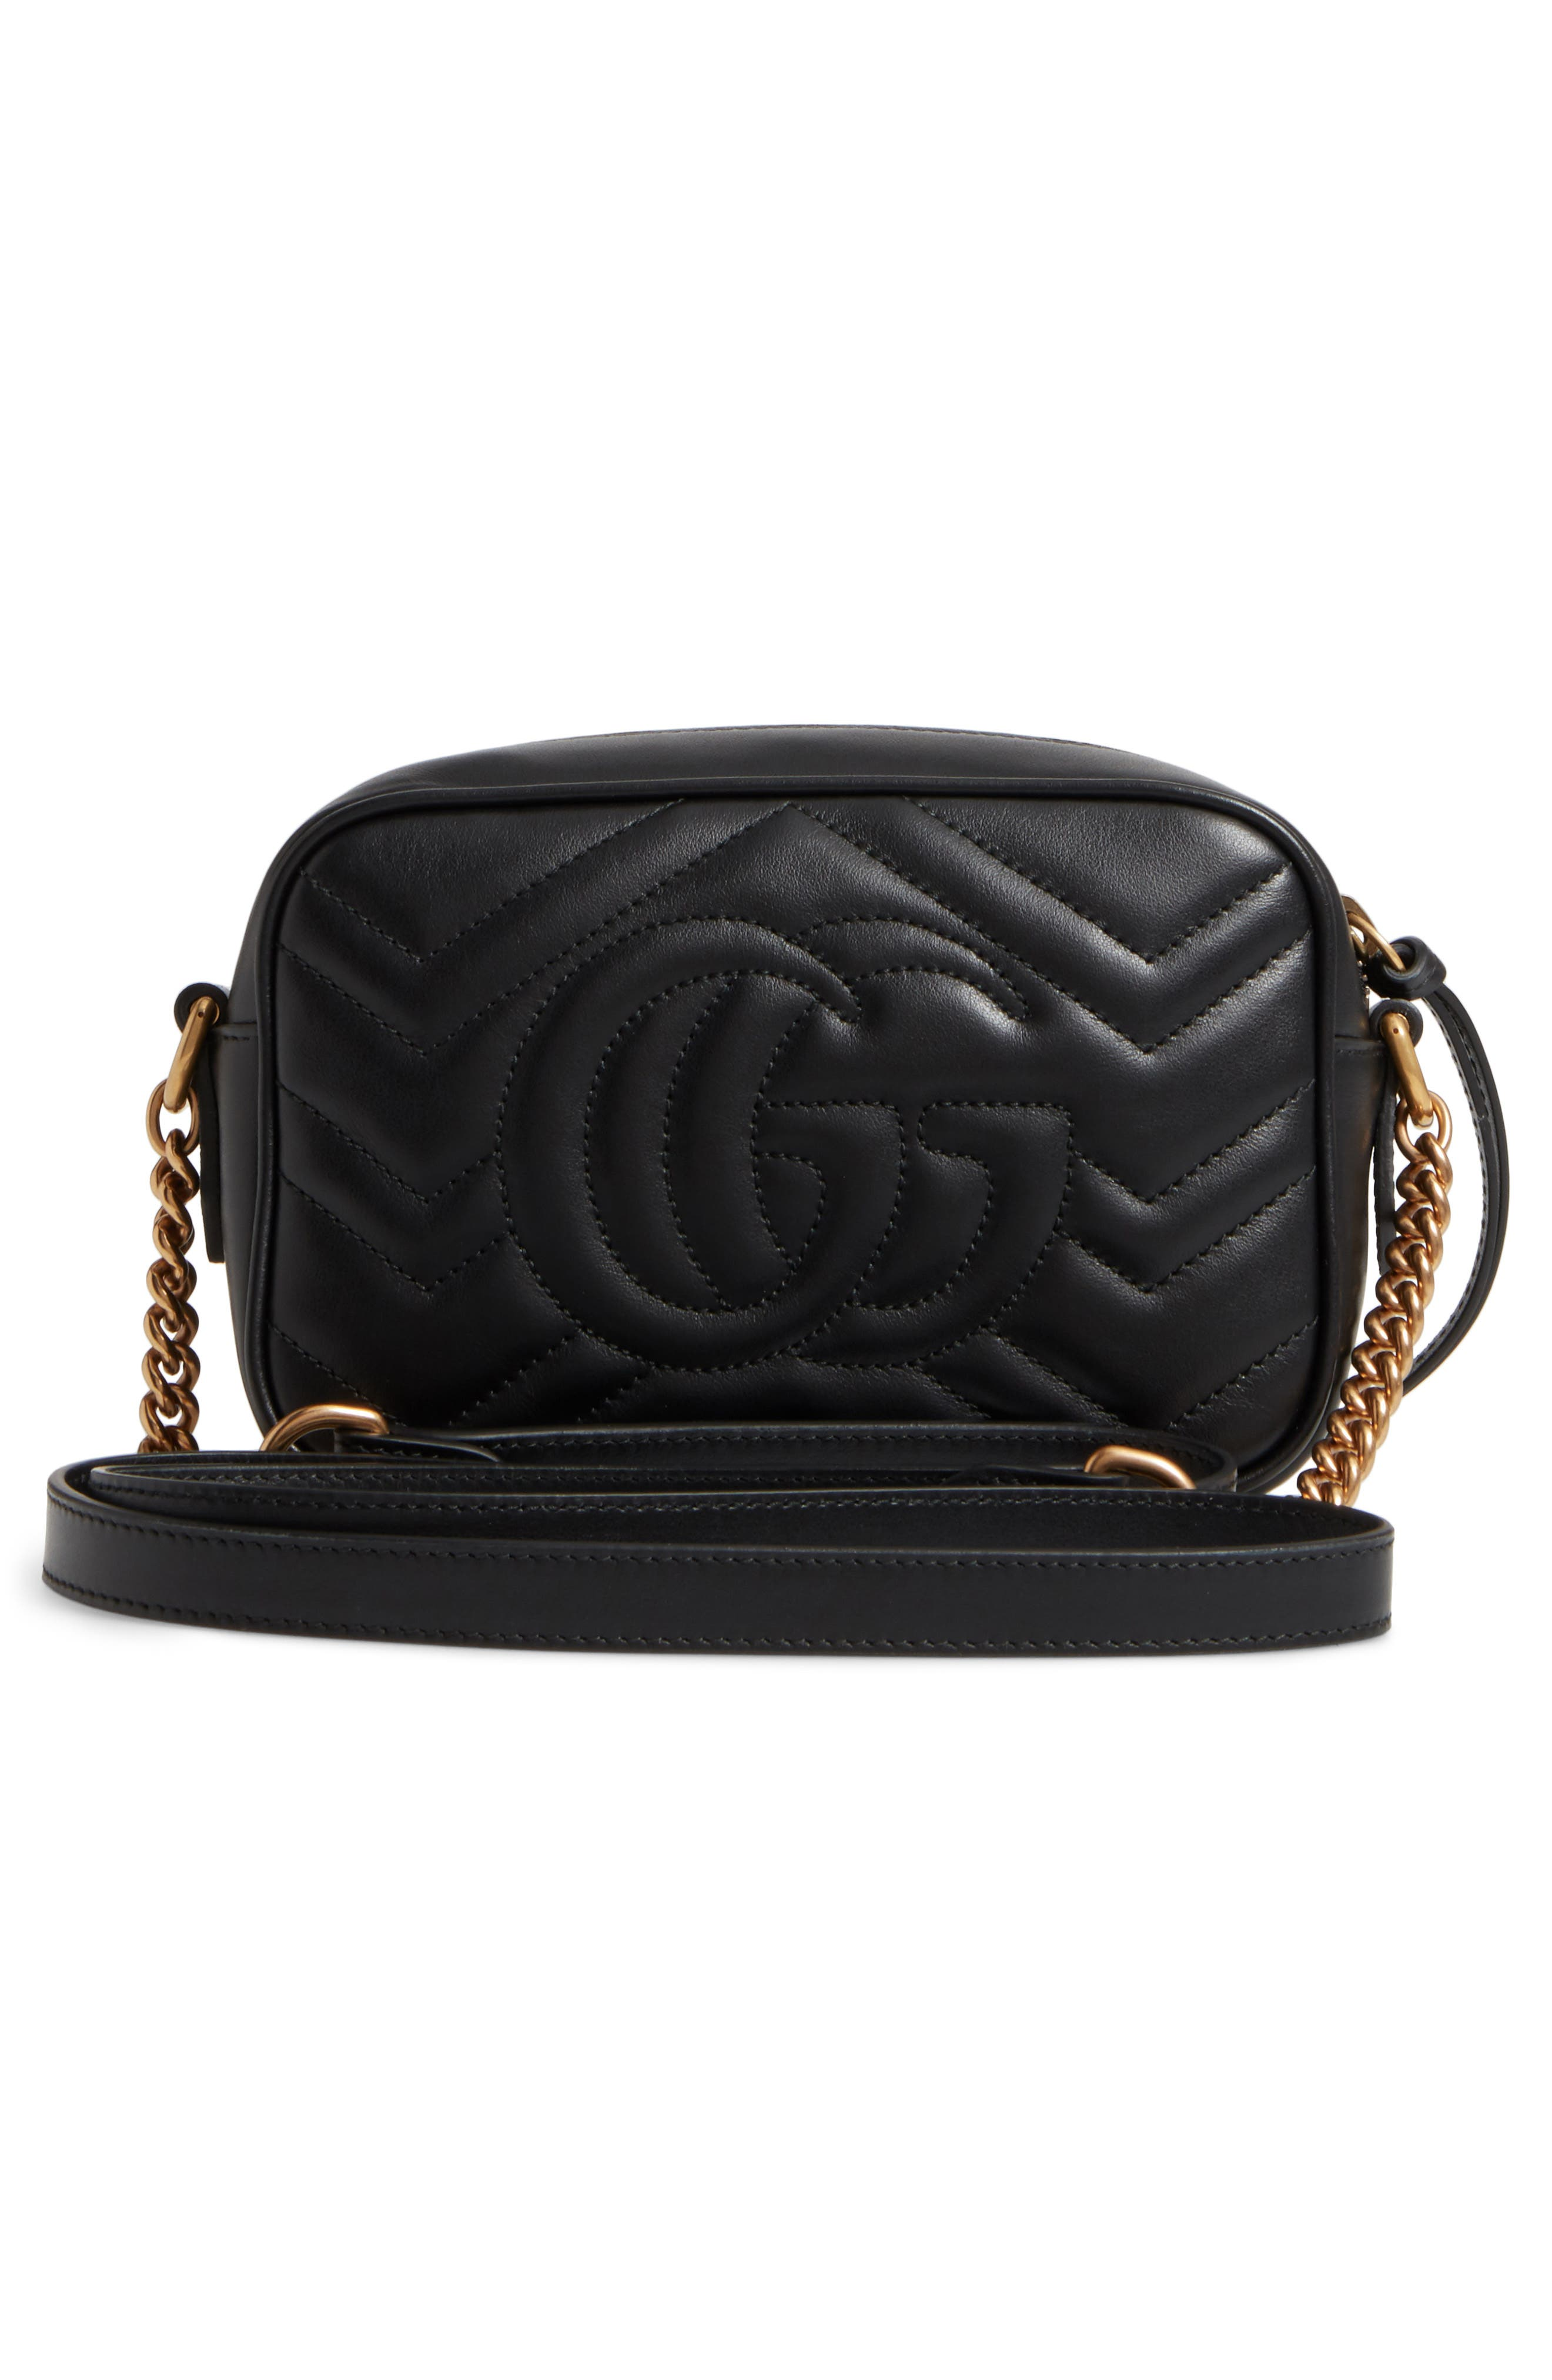 Alternate Image 3  - Gucci GG Marmont 2.0 Matelassé Leather Shoulder Bag